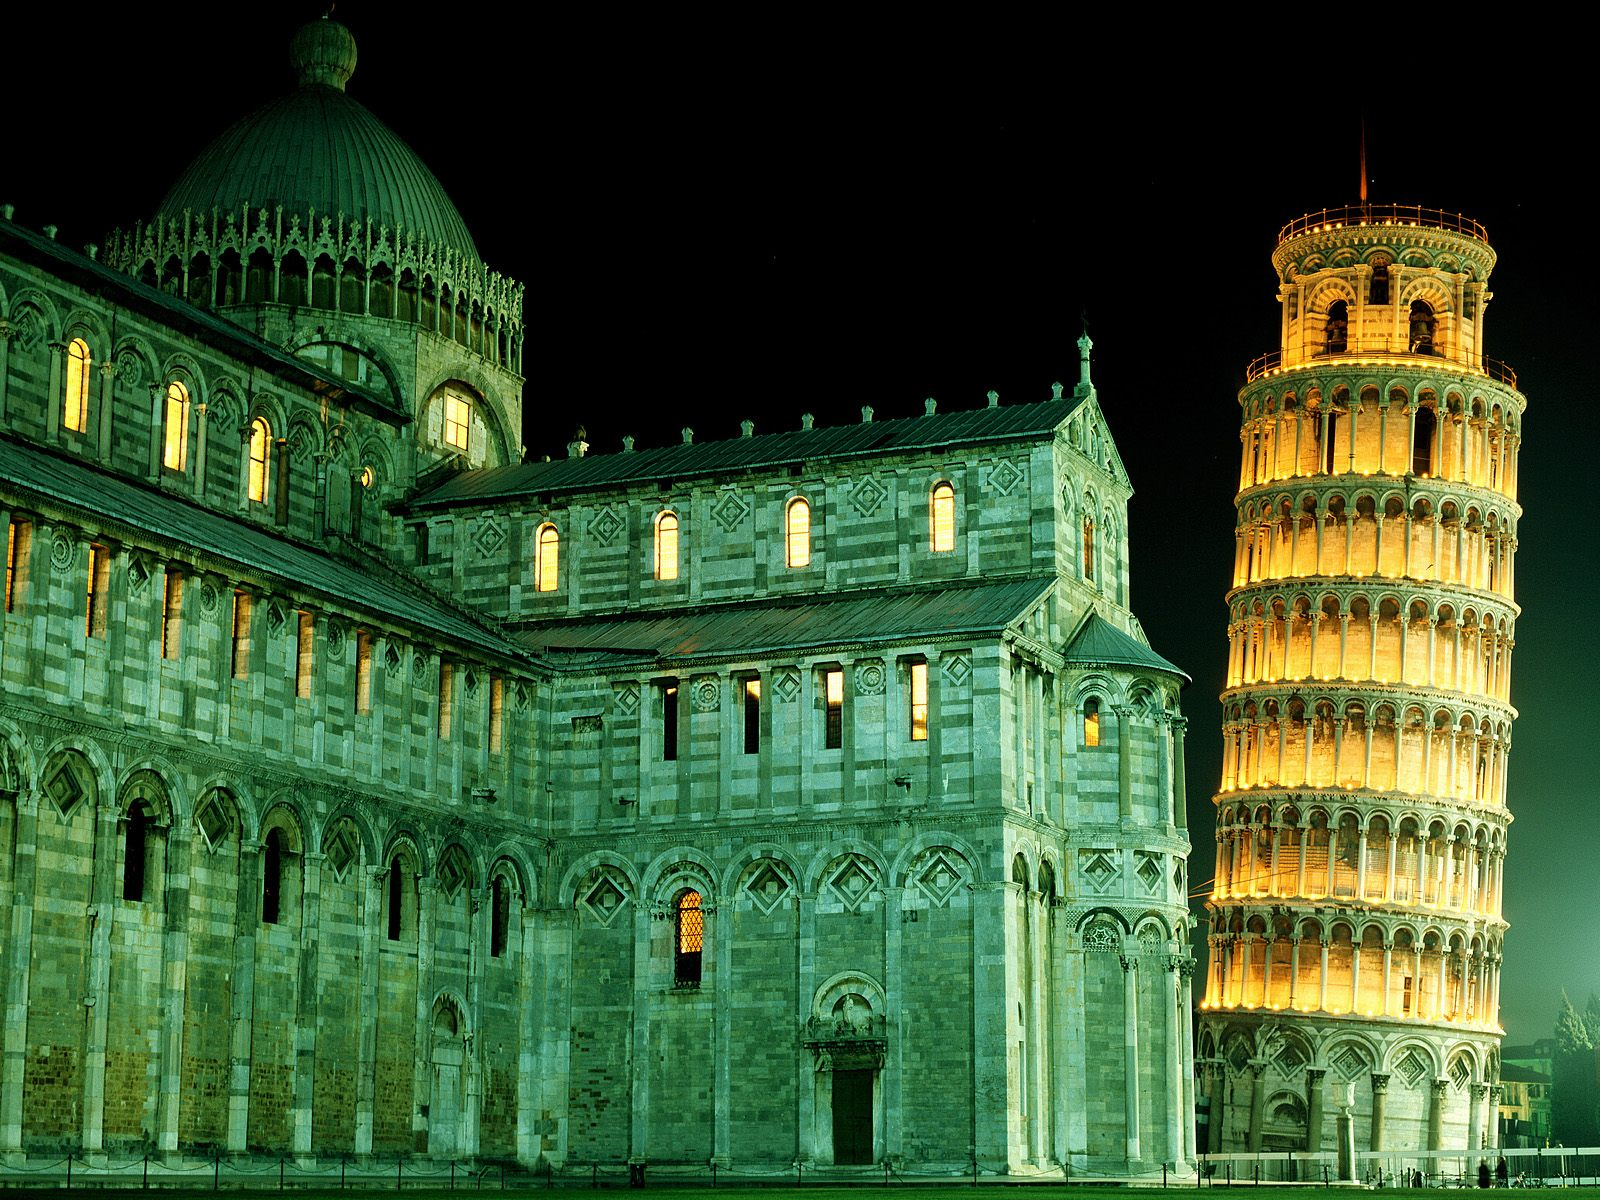 Recap from Pisa, Italy!